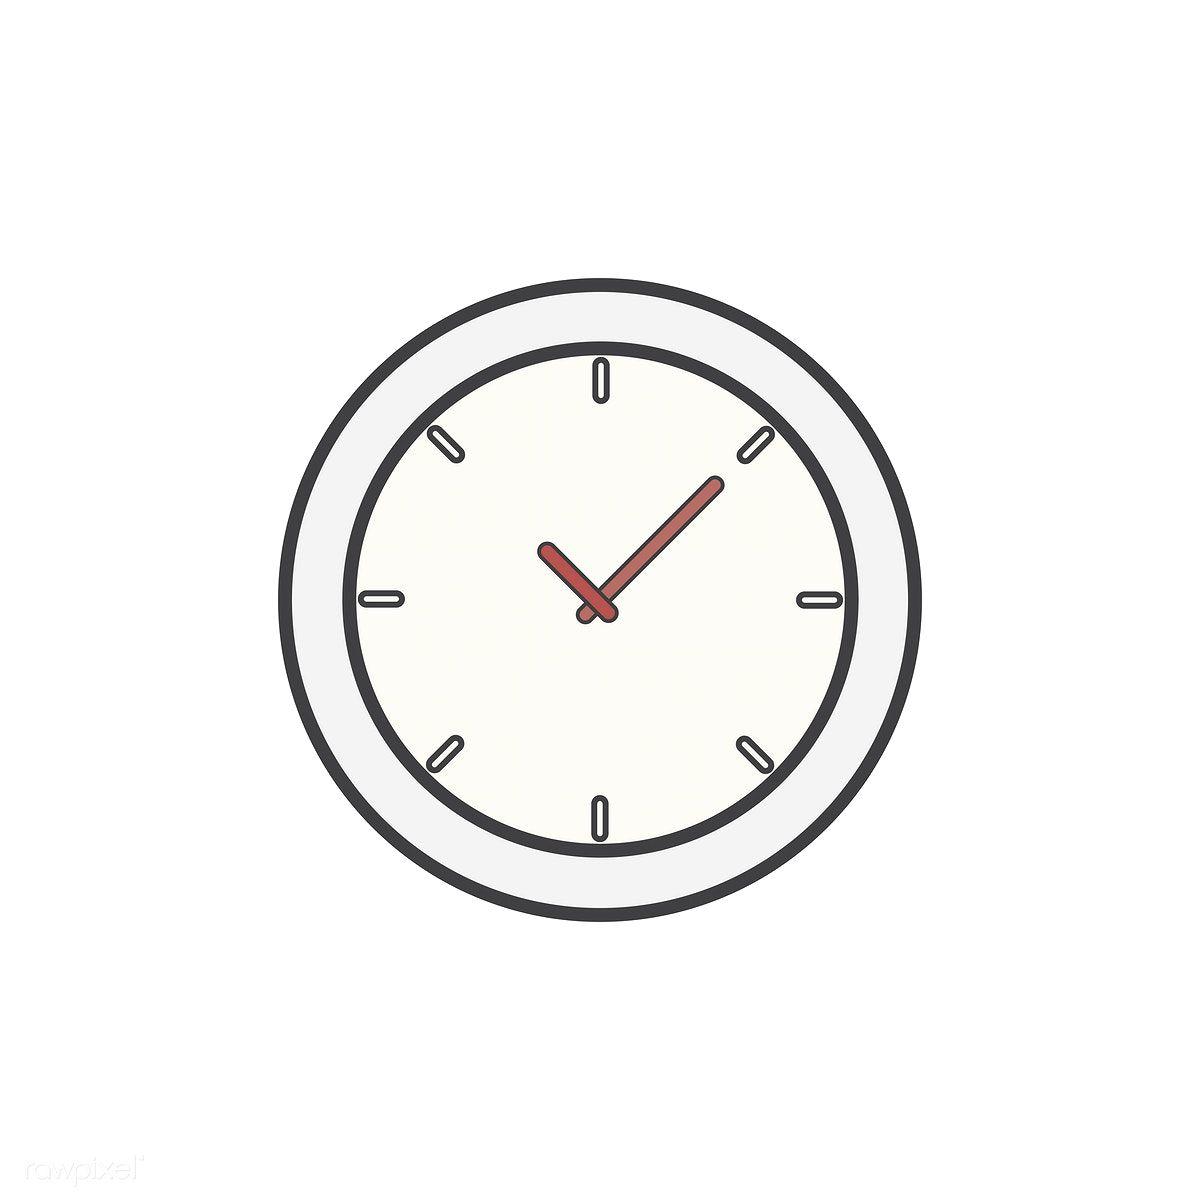 Illustration Of Clock Icon Free Image By Rawpixel Com Clock Icon Icon Phone Icon